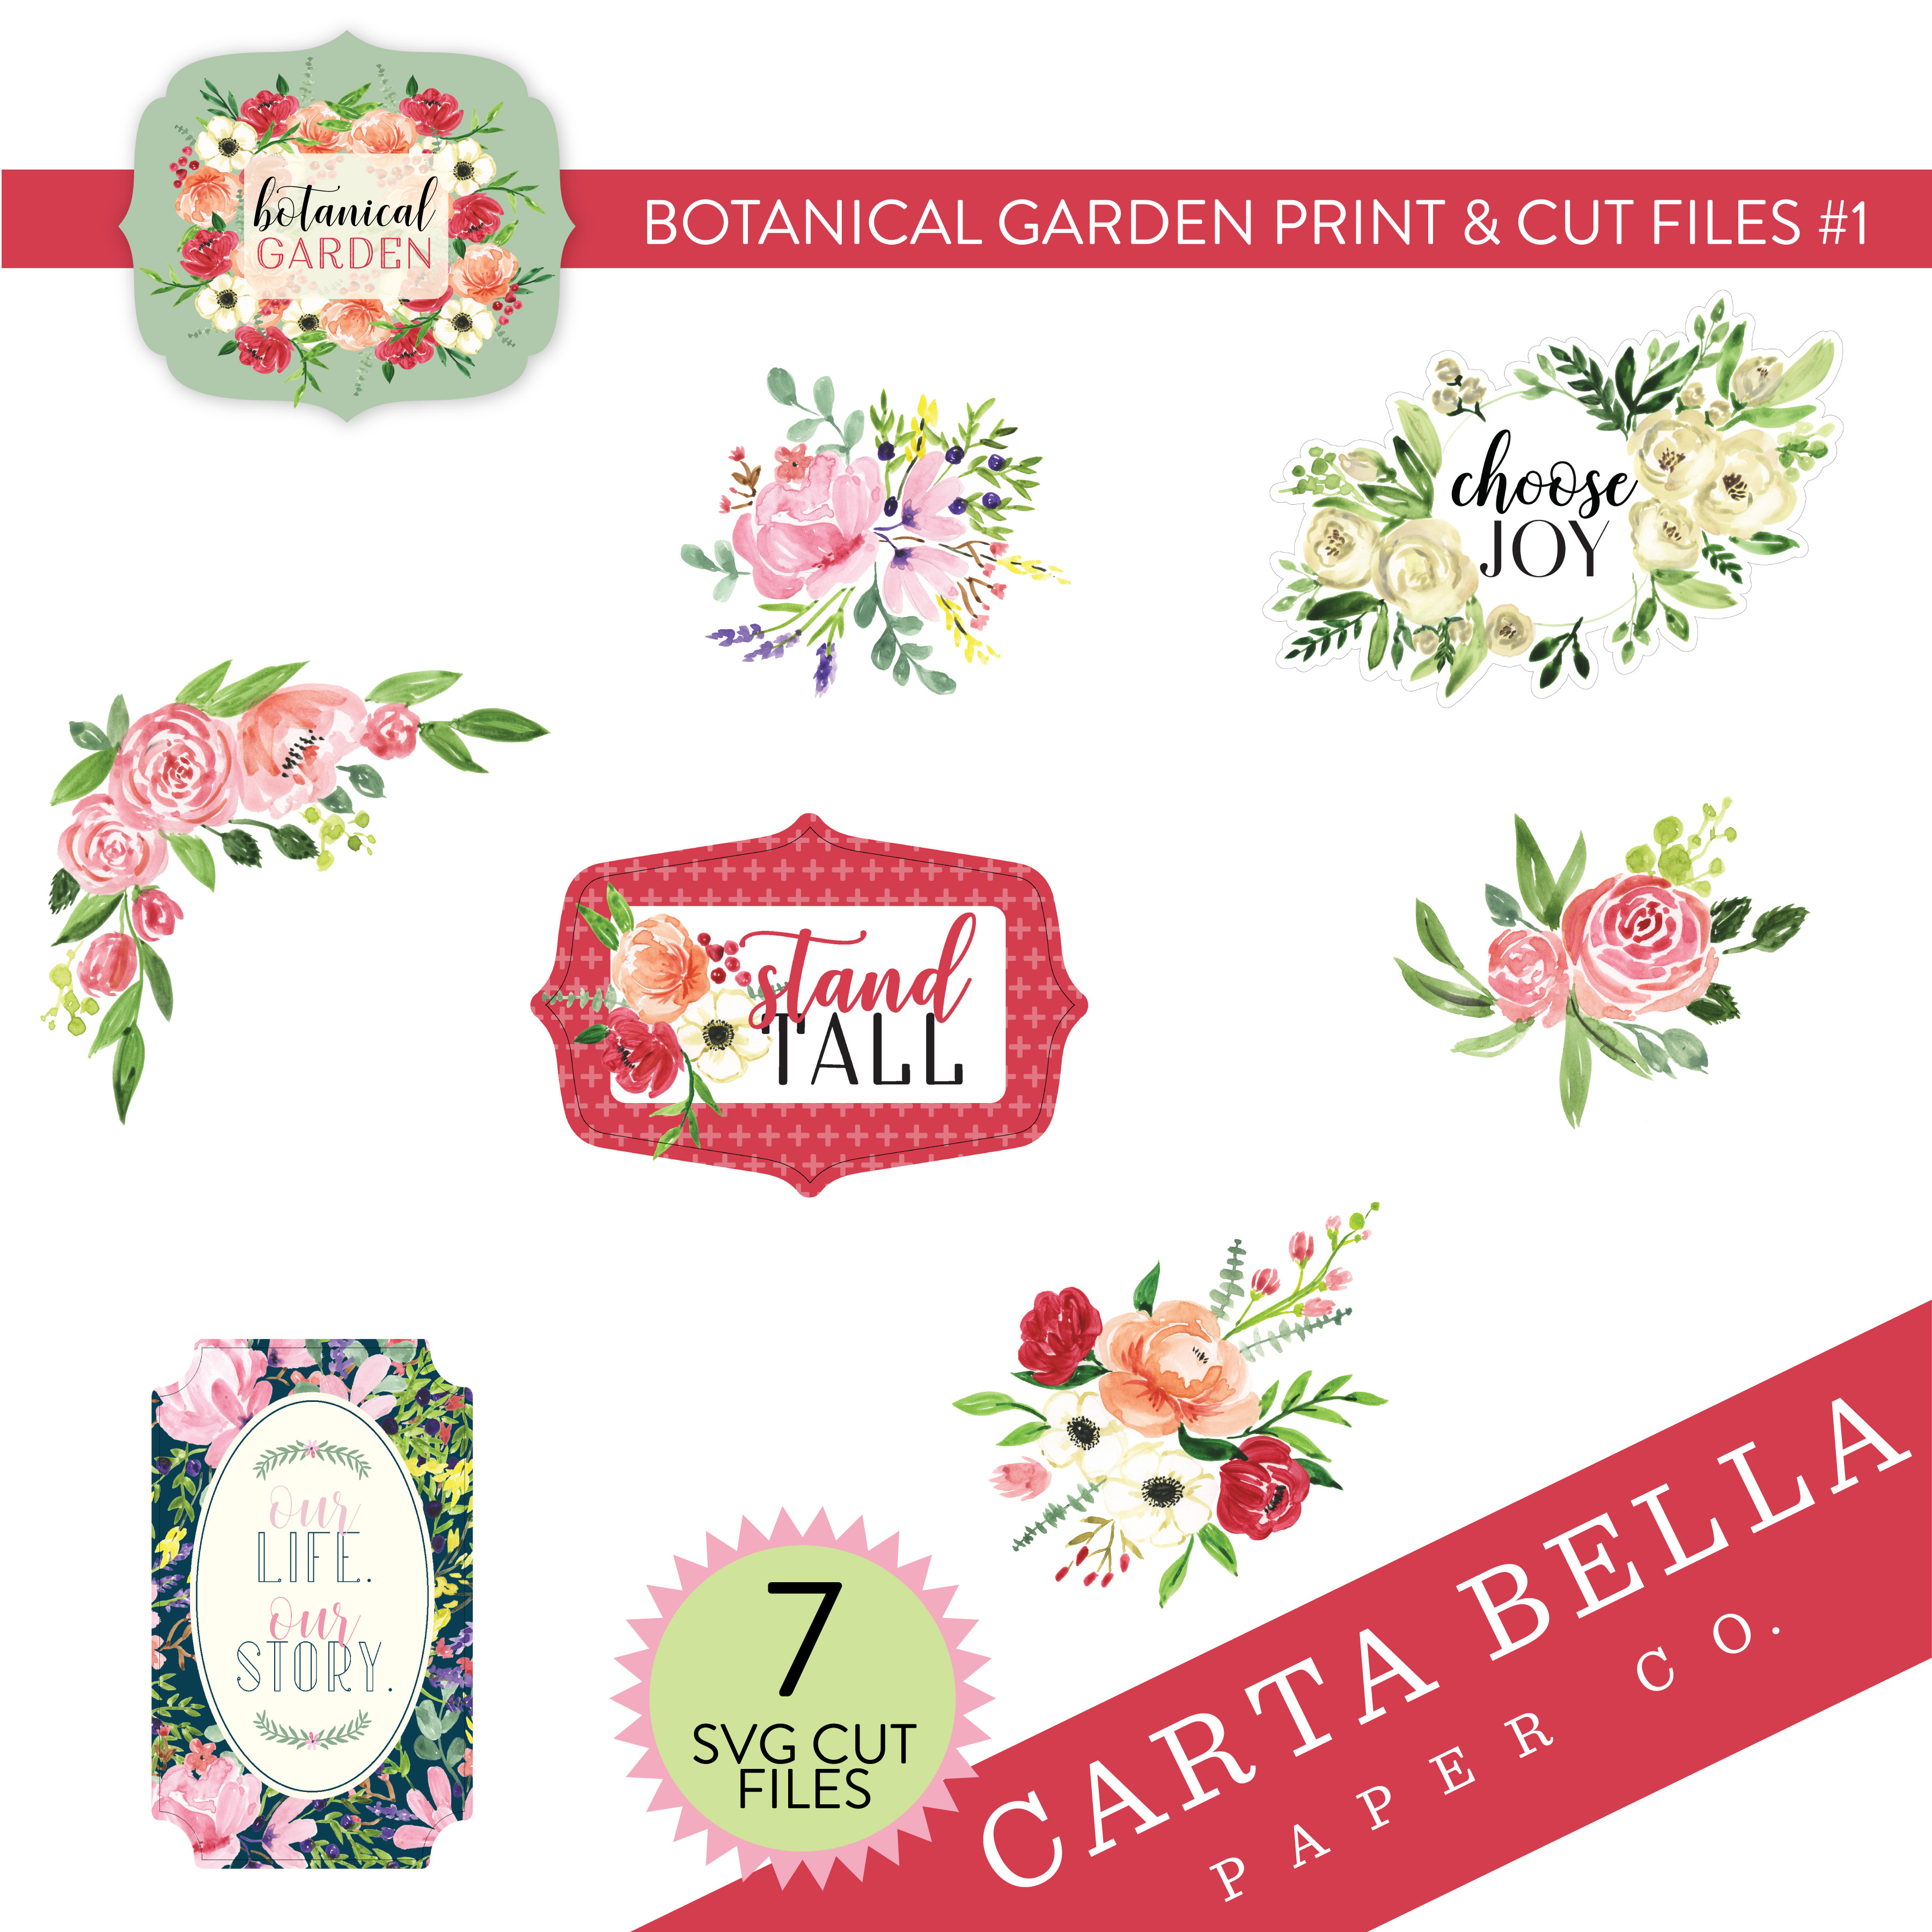 Botanical Garden Print & Cut Files #1